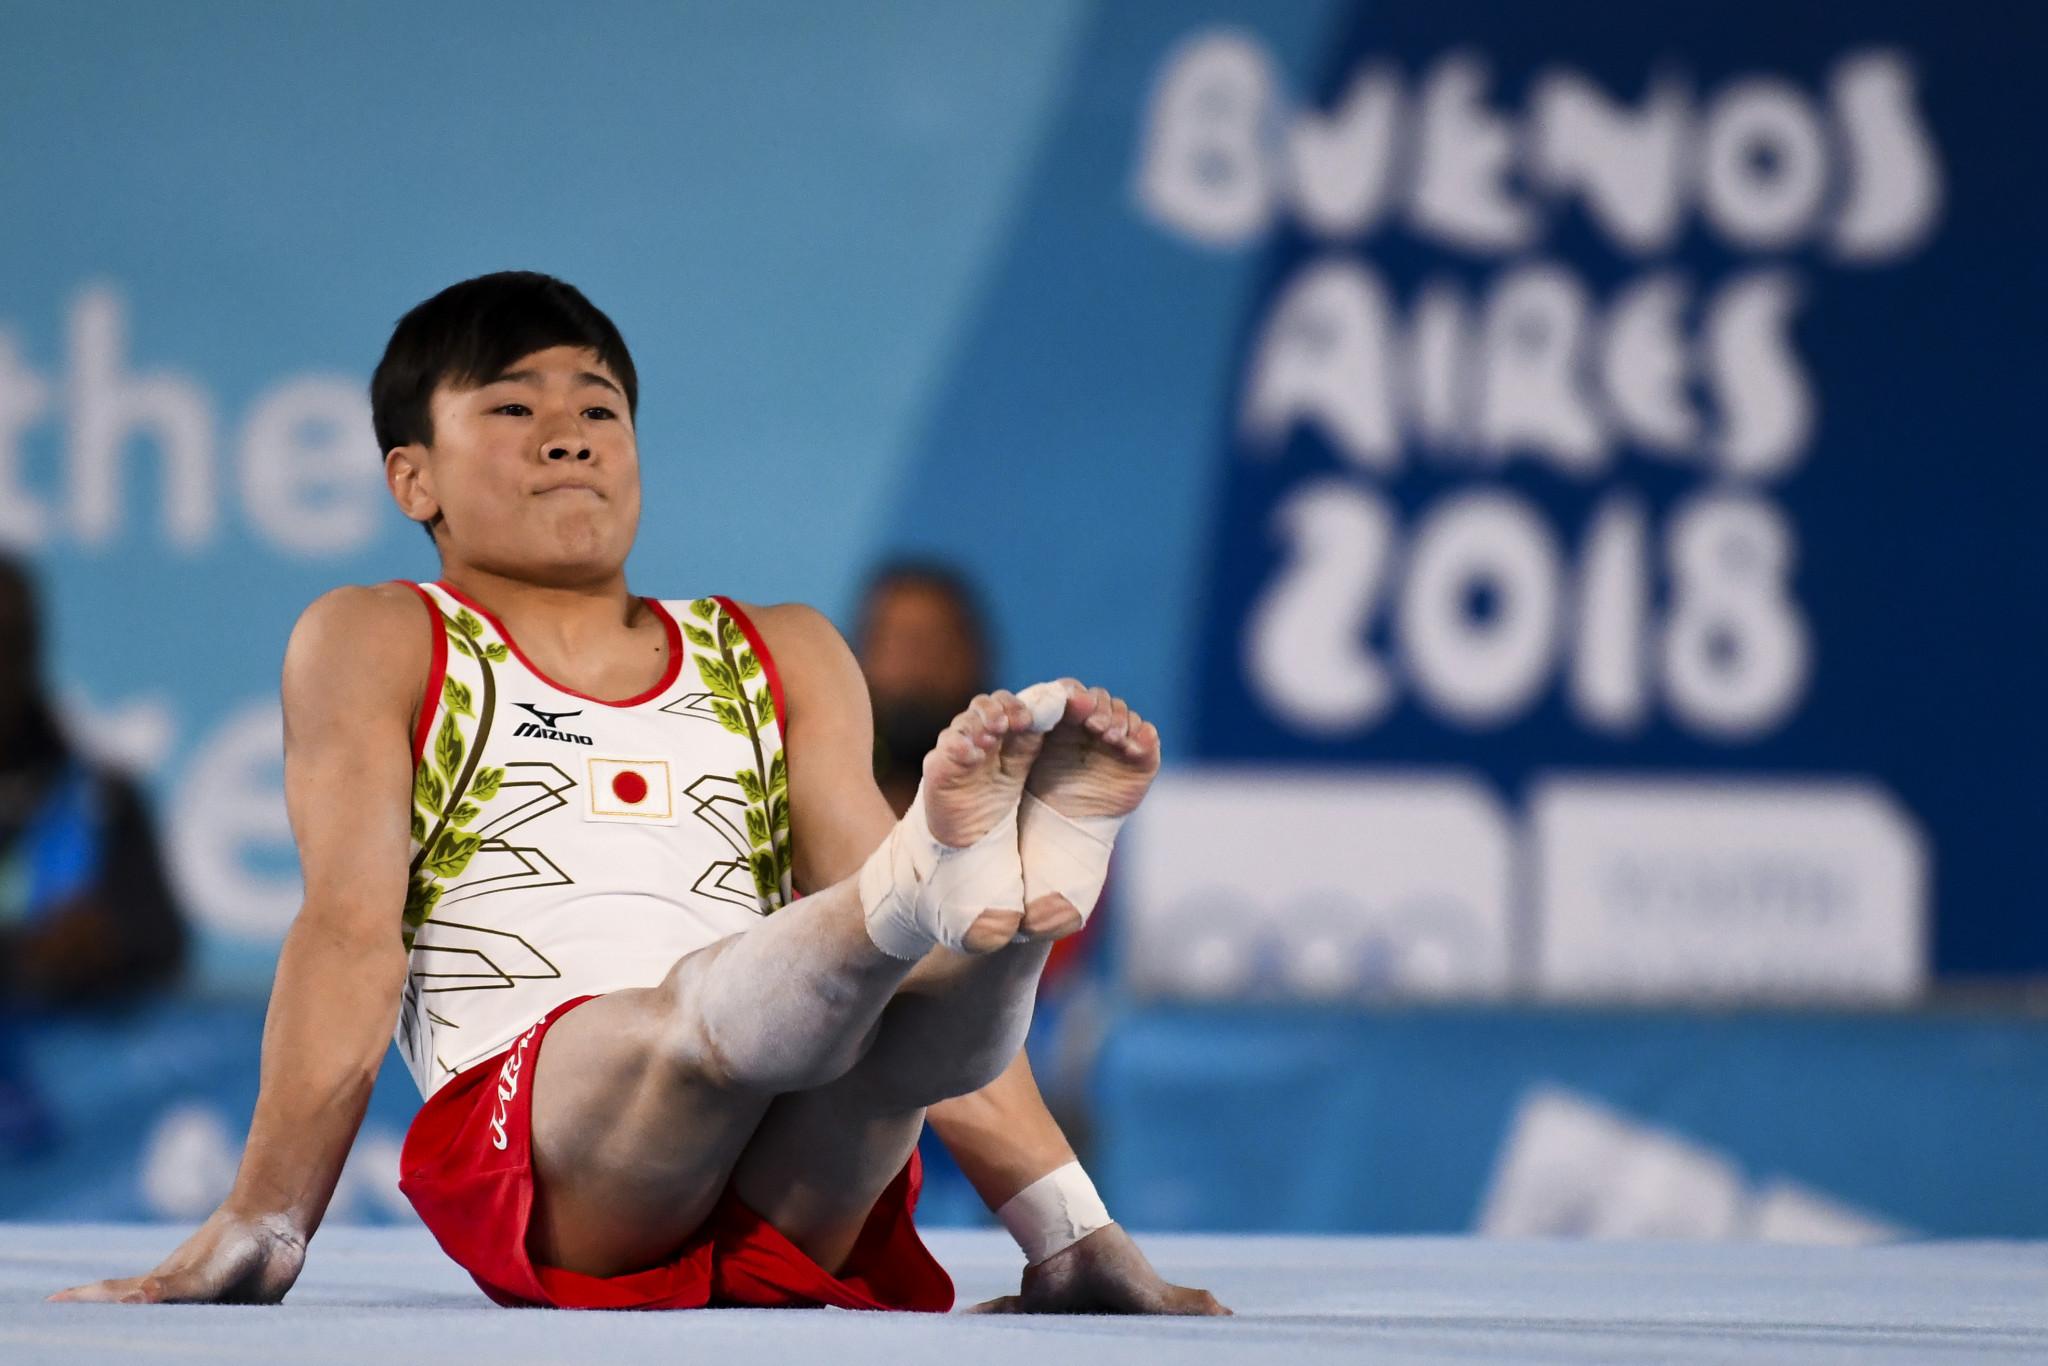 Takeru Kitazono won the men's all-around gymnastics title ©Getty Images